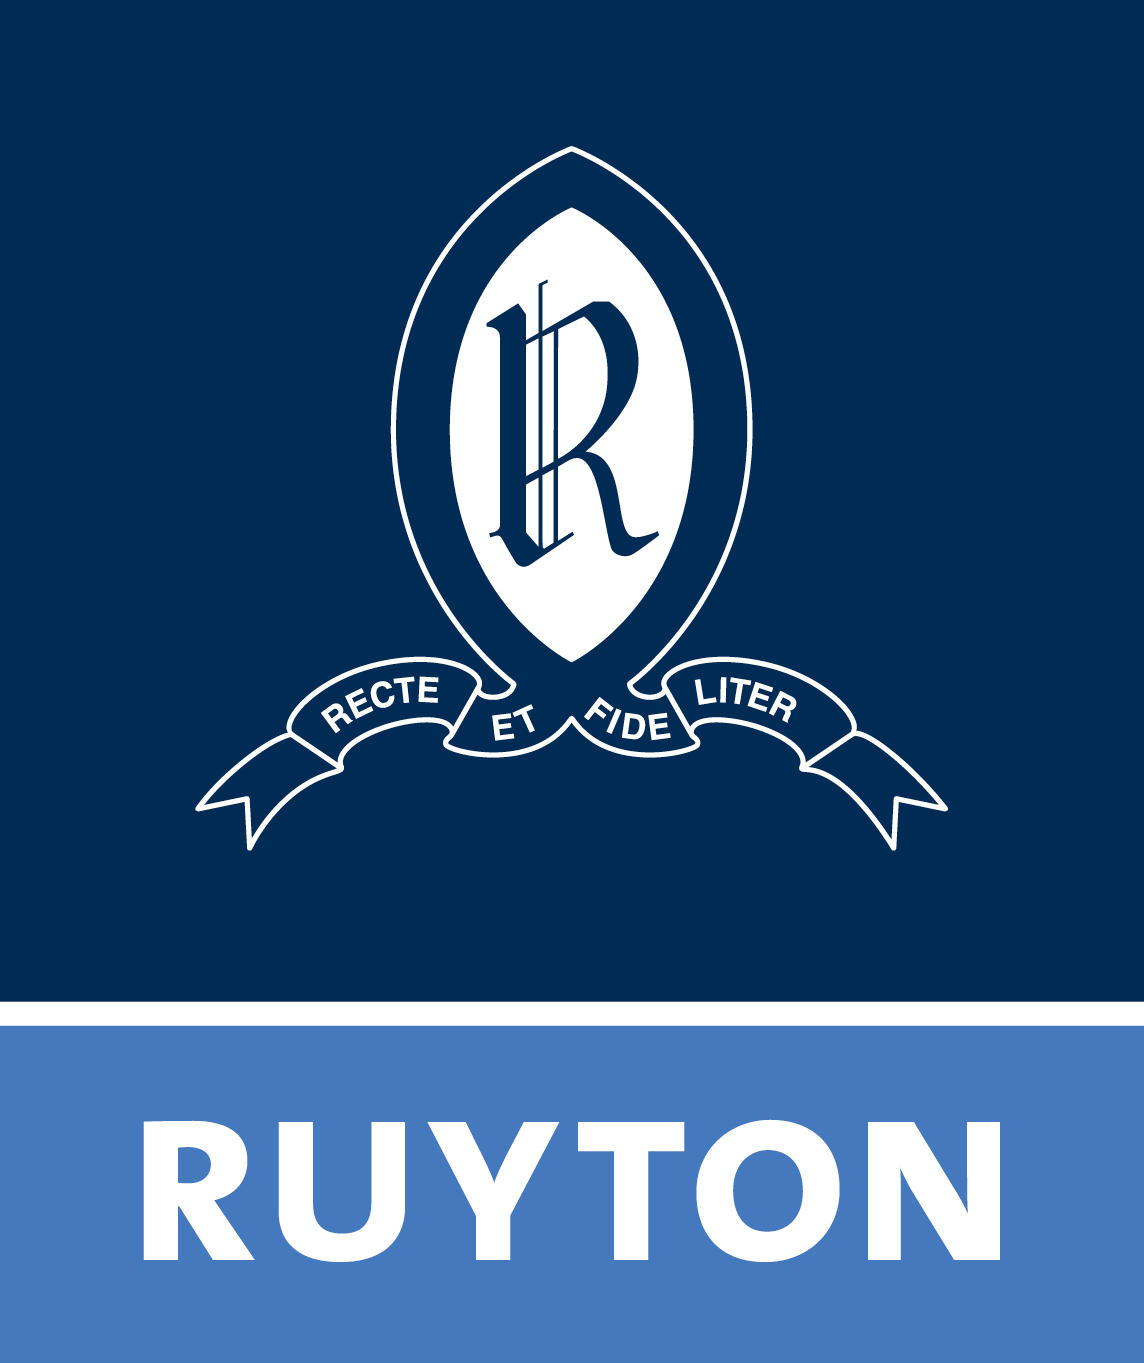 Ruyton logo .jpeg